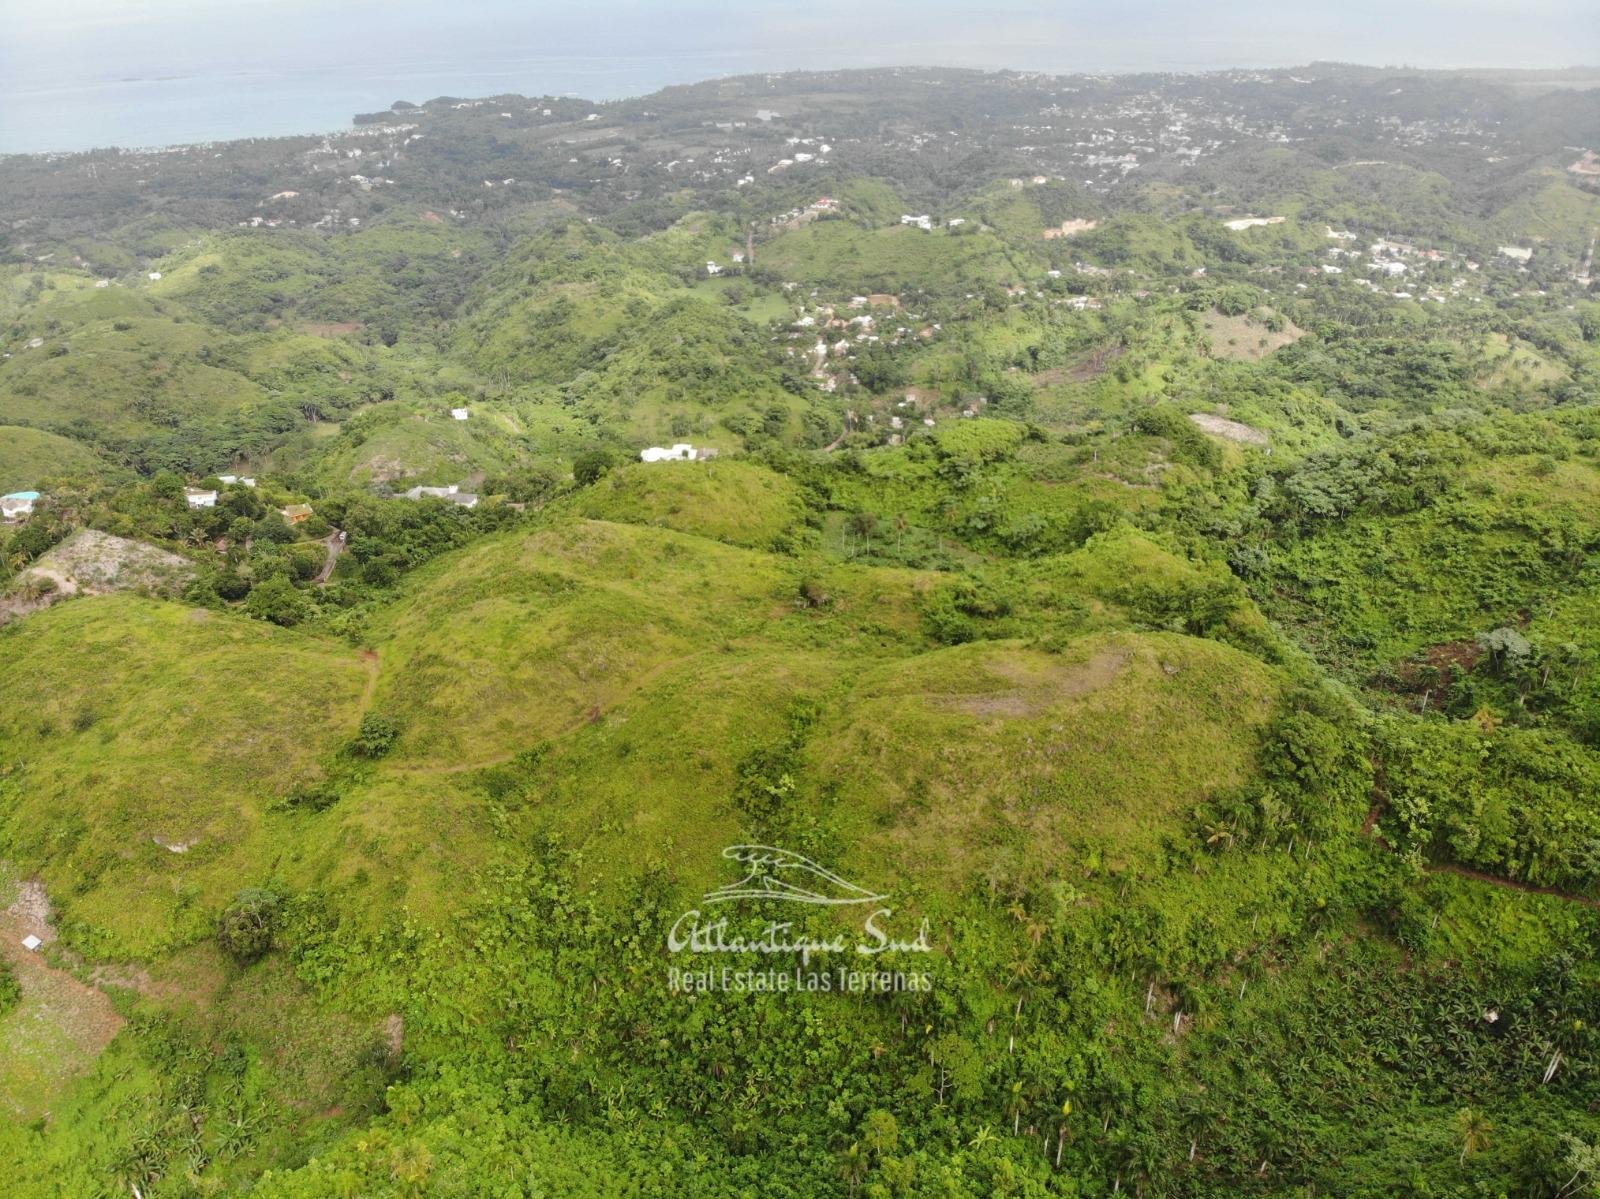 Hills for sale in Las Terrenas Dominican Republic 12.jpeg